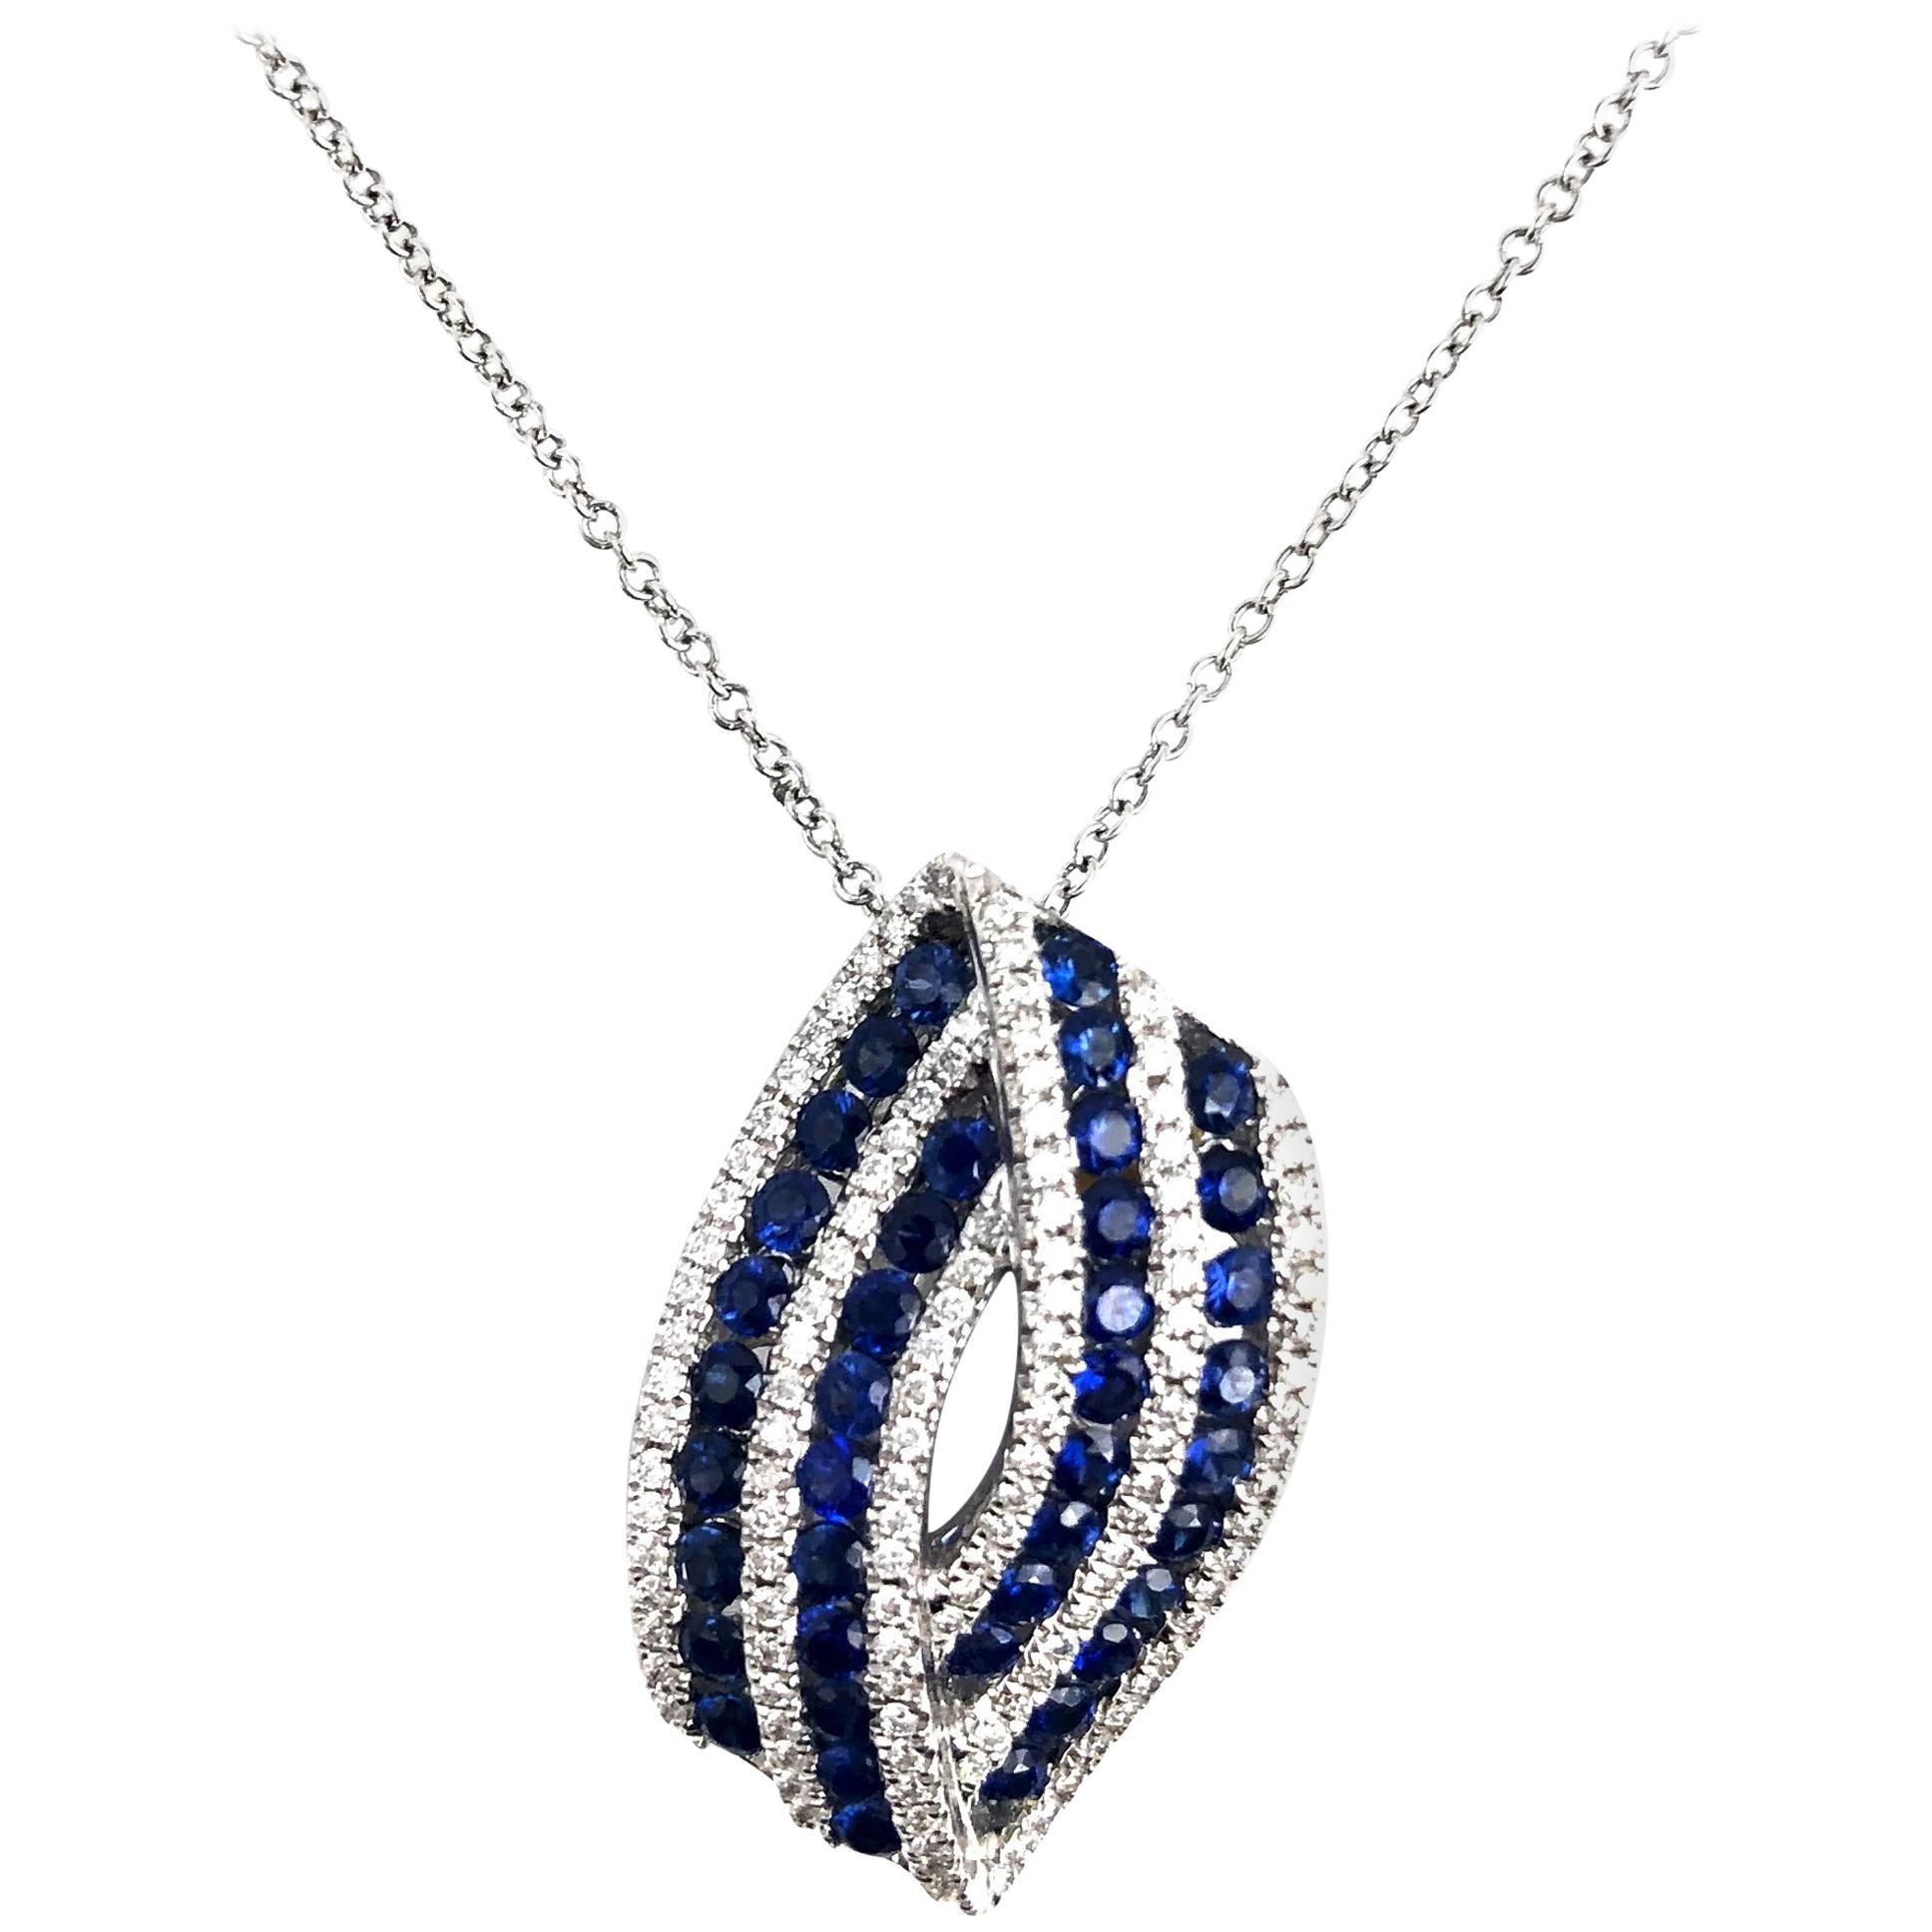 DiamondTown 1.11 Carat Ceylon Sapphire and 0.32 Carat Diamond Pendant